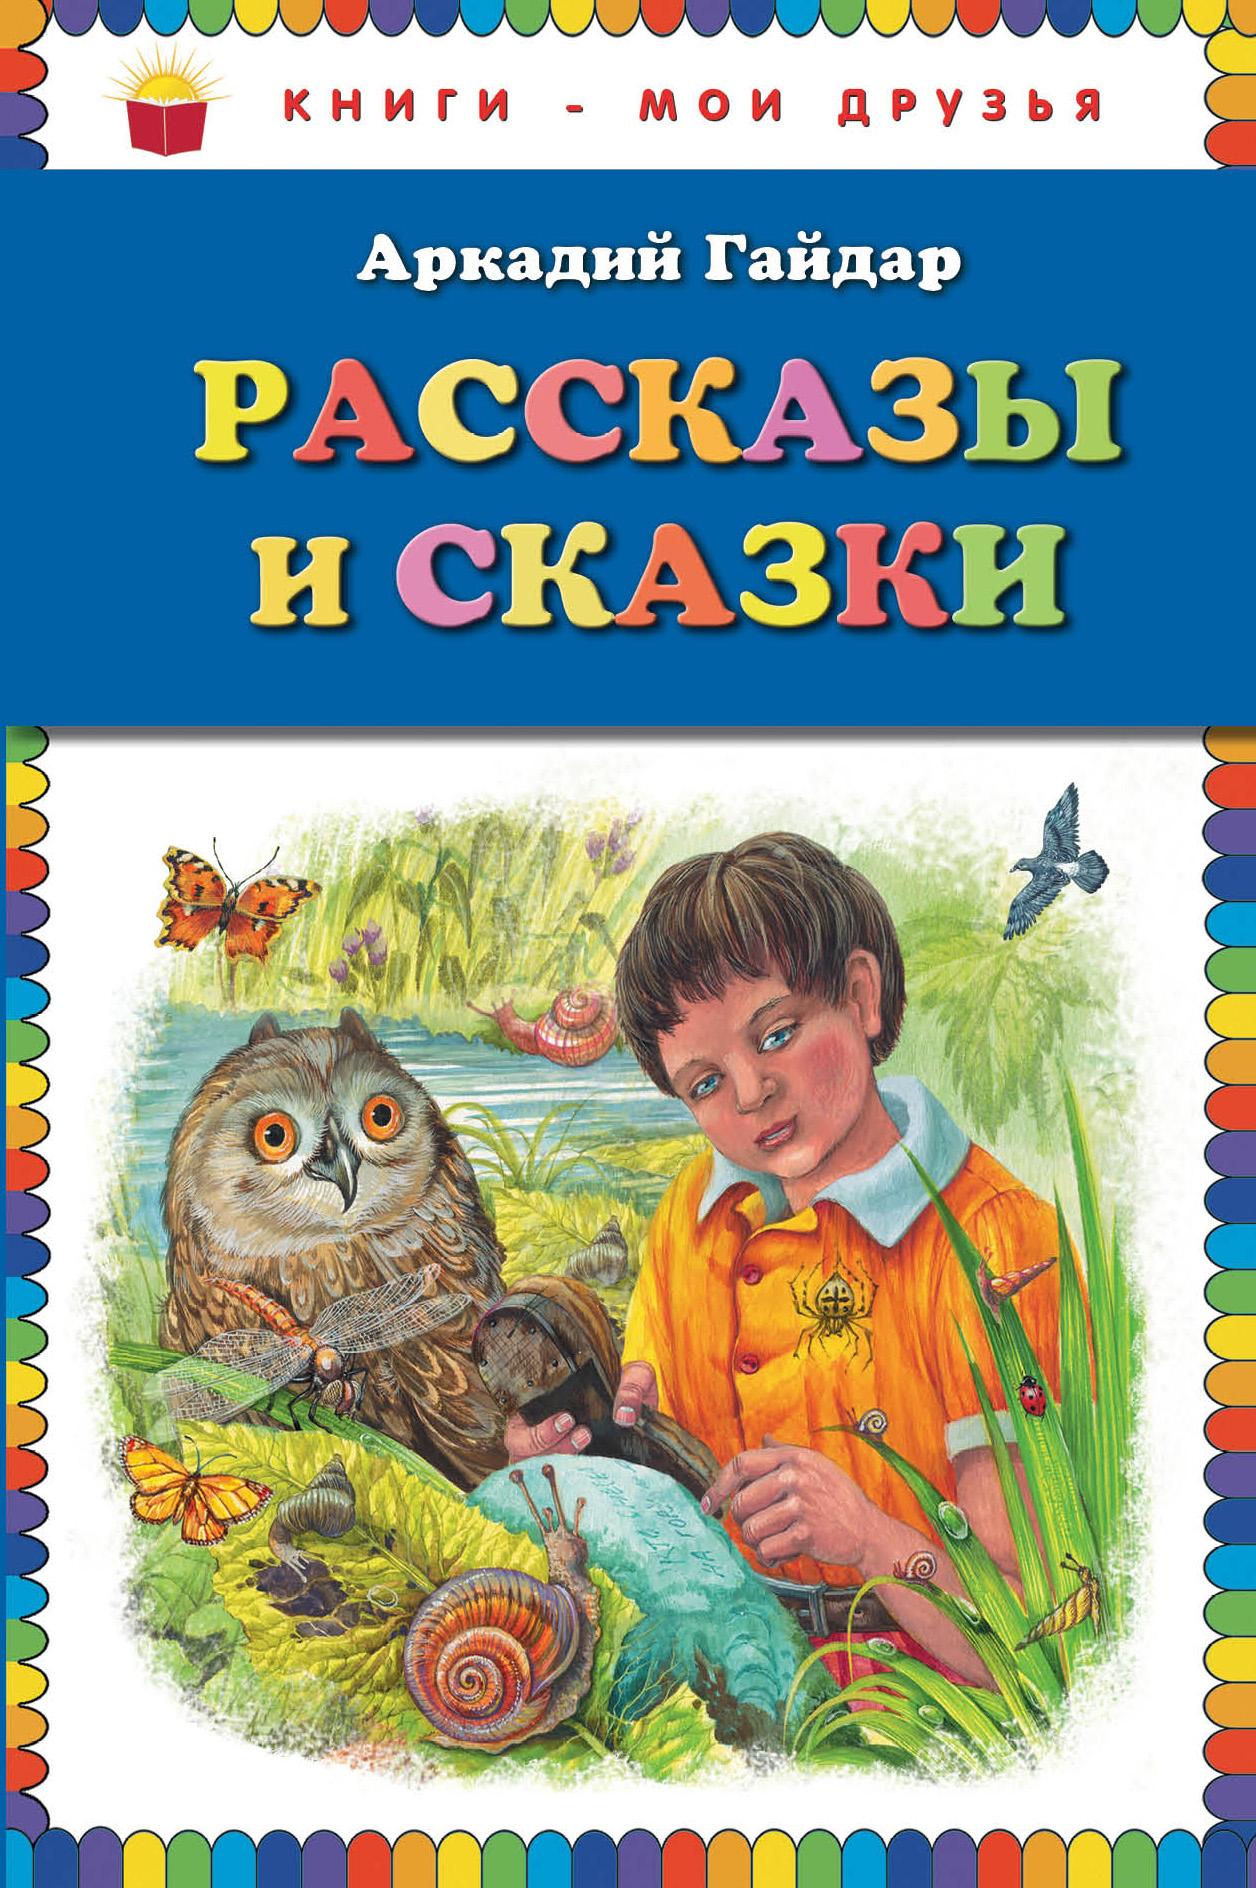 Рассказы и сказки_ от book24.ru